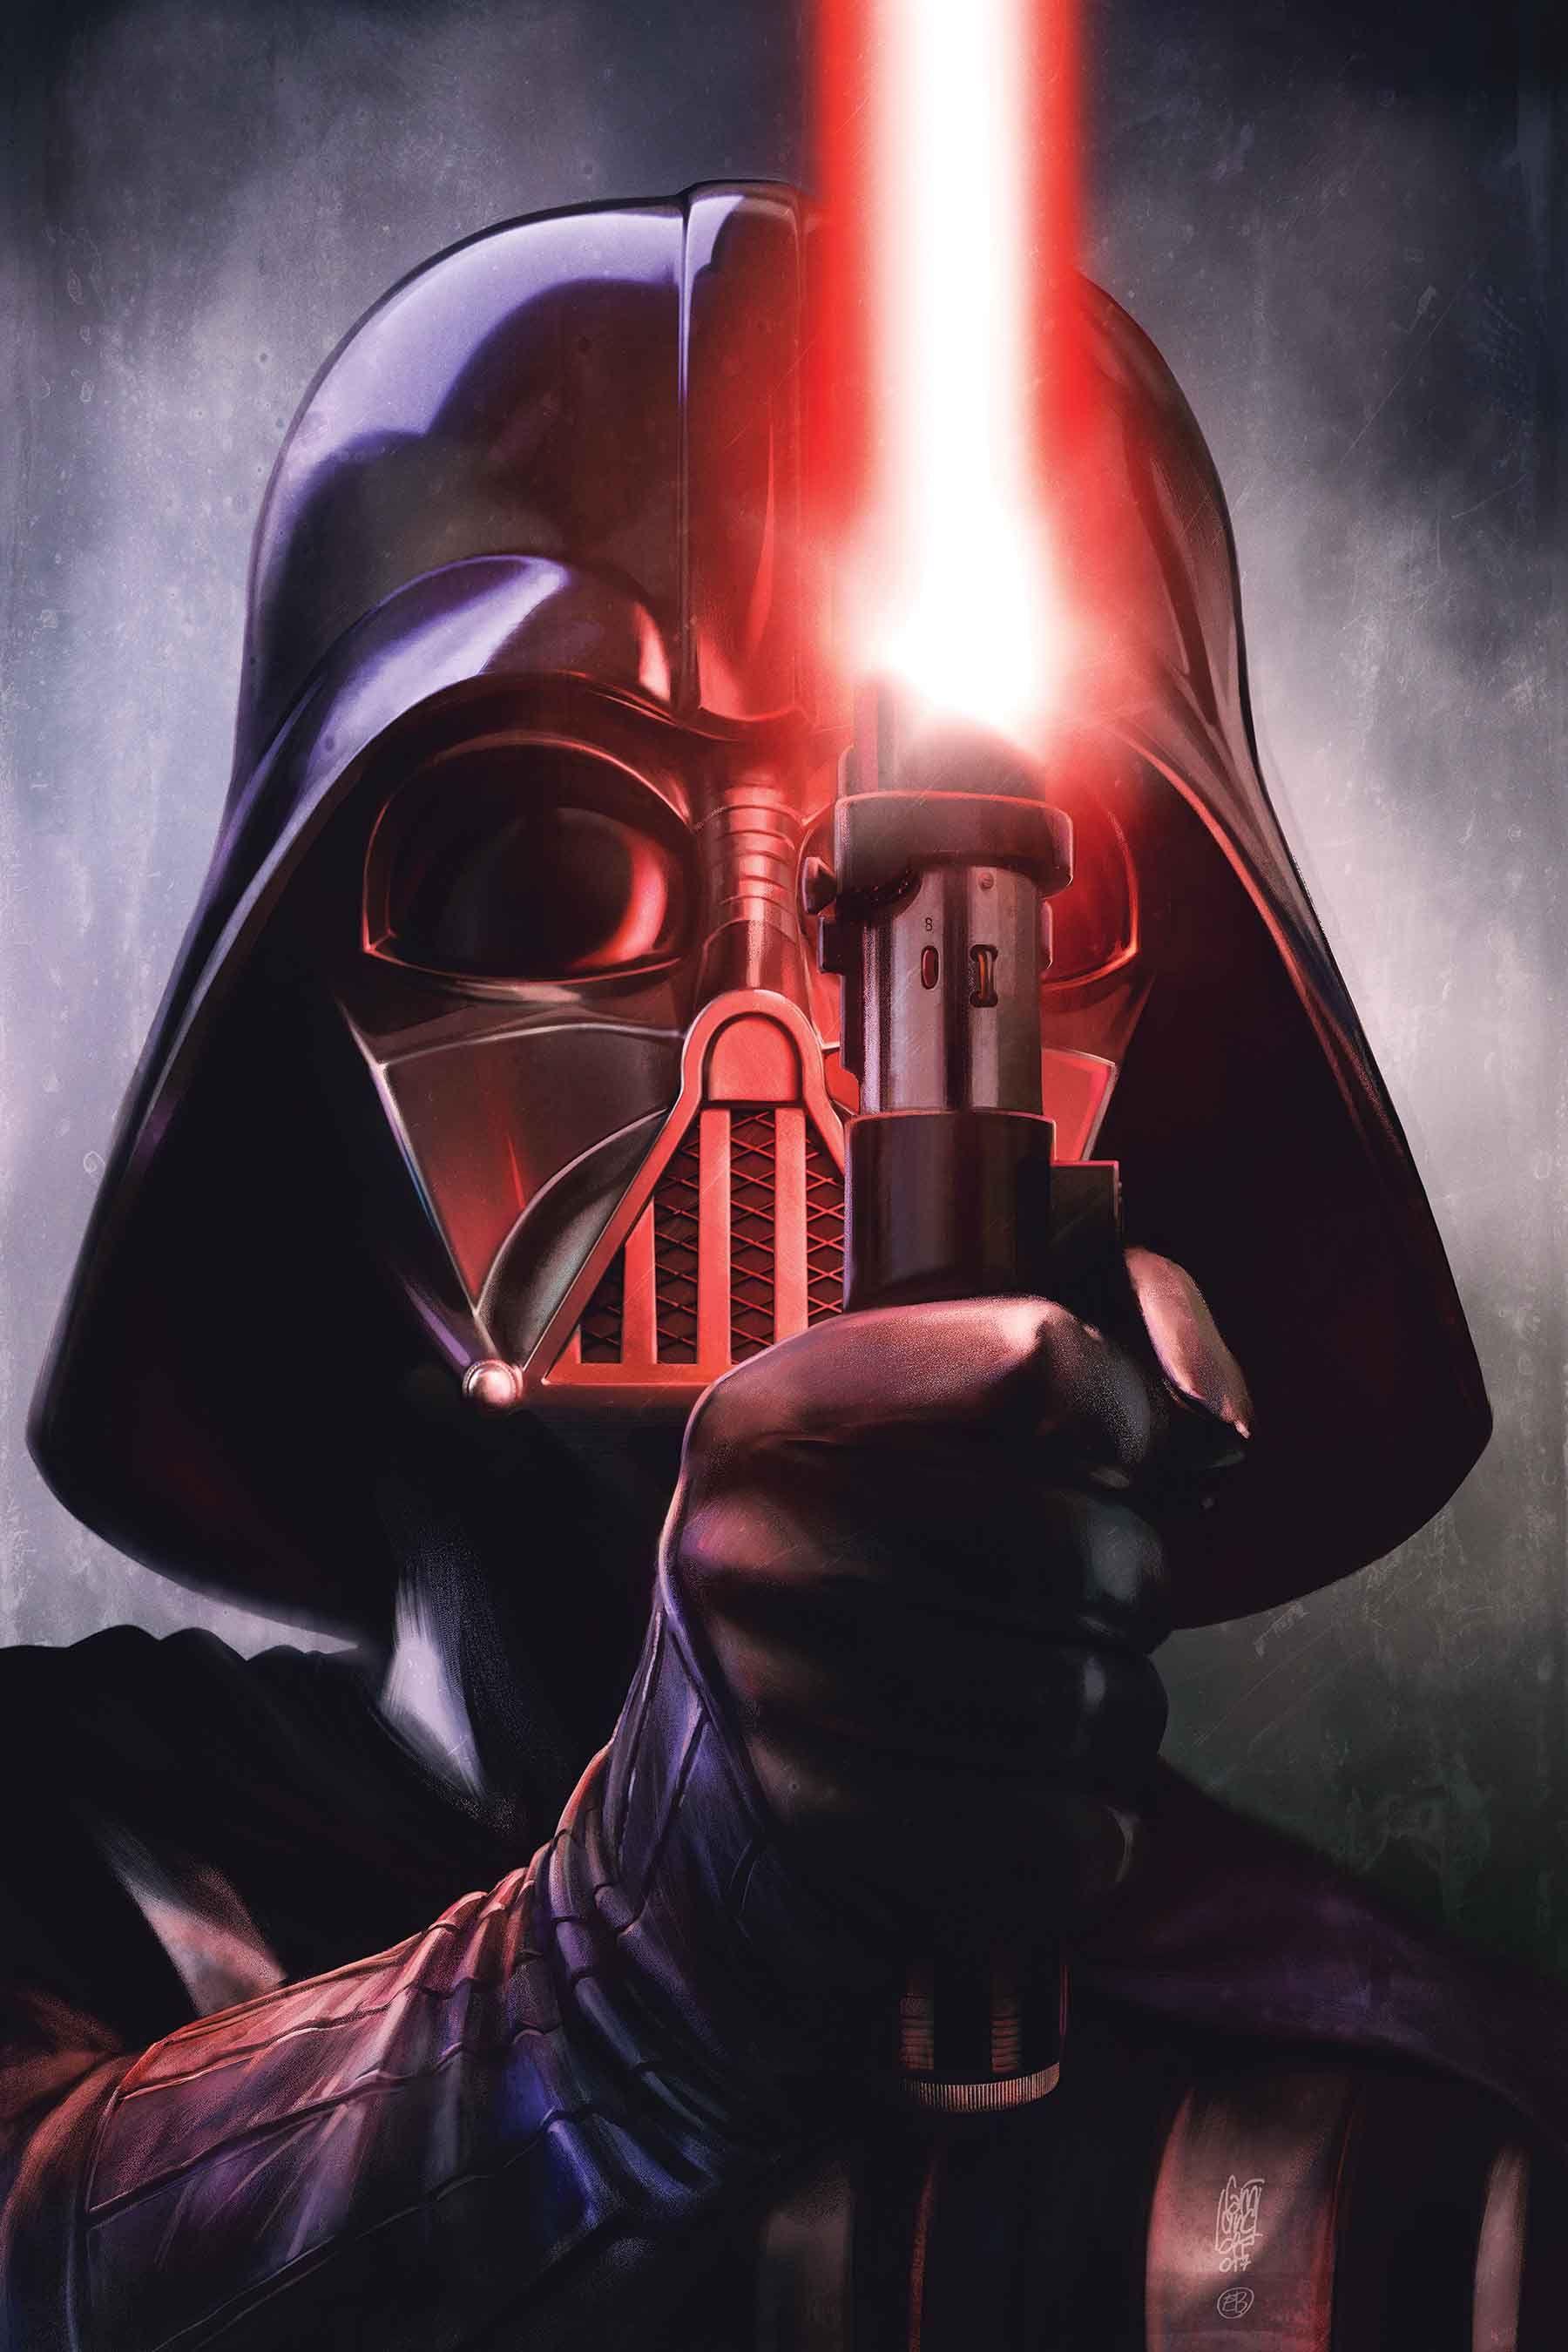 Darth Vader Dark Lord Of The Sith 12 Capa Desenhada Por Giuseppe Camuncoli Elia Bonetti Star Wars Images Star Wars Pictures Star Wars Wallpaper